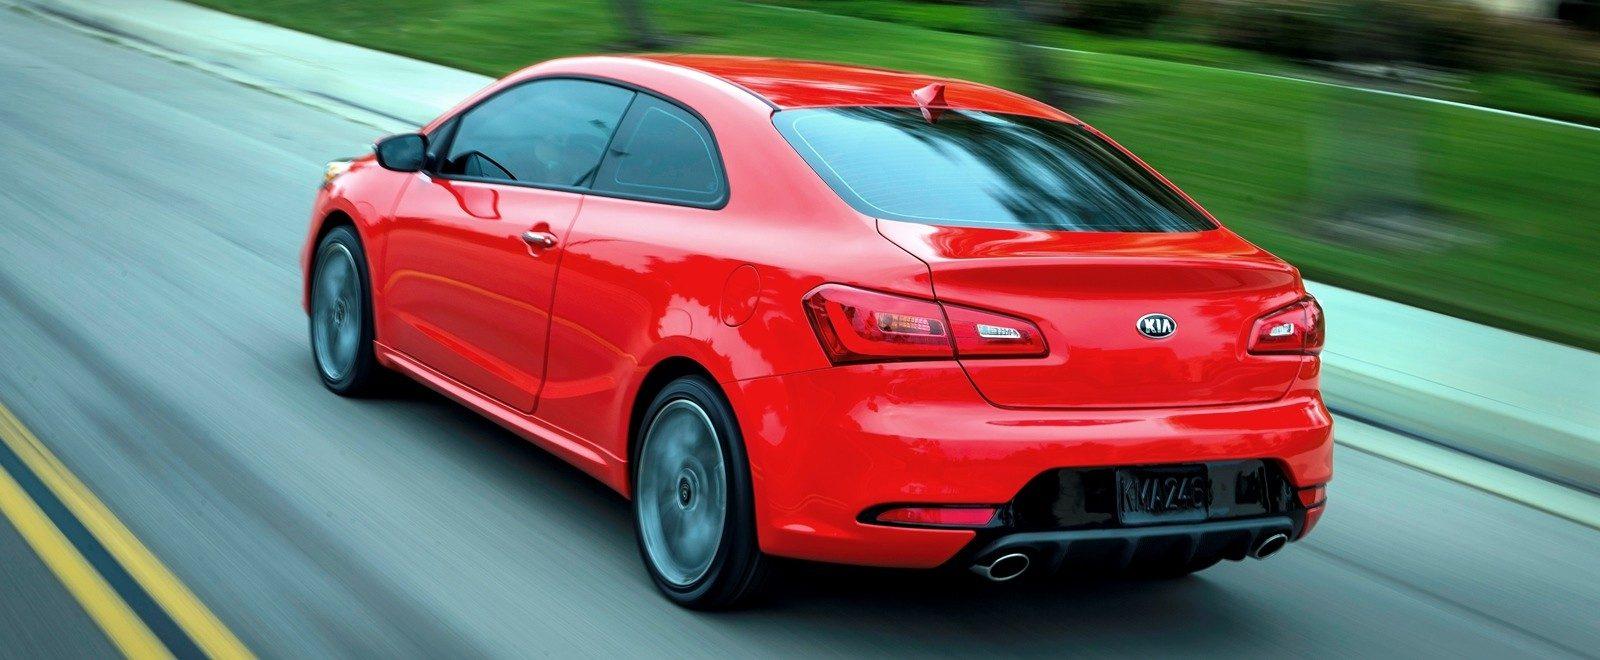 2014 Kia Forte Koup Spooling Up New Turbo Power For Slinky 2 Door